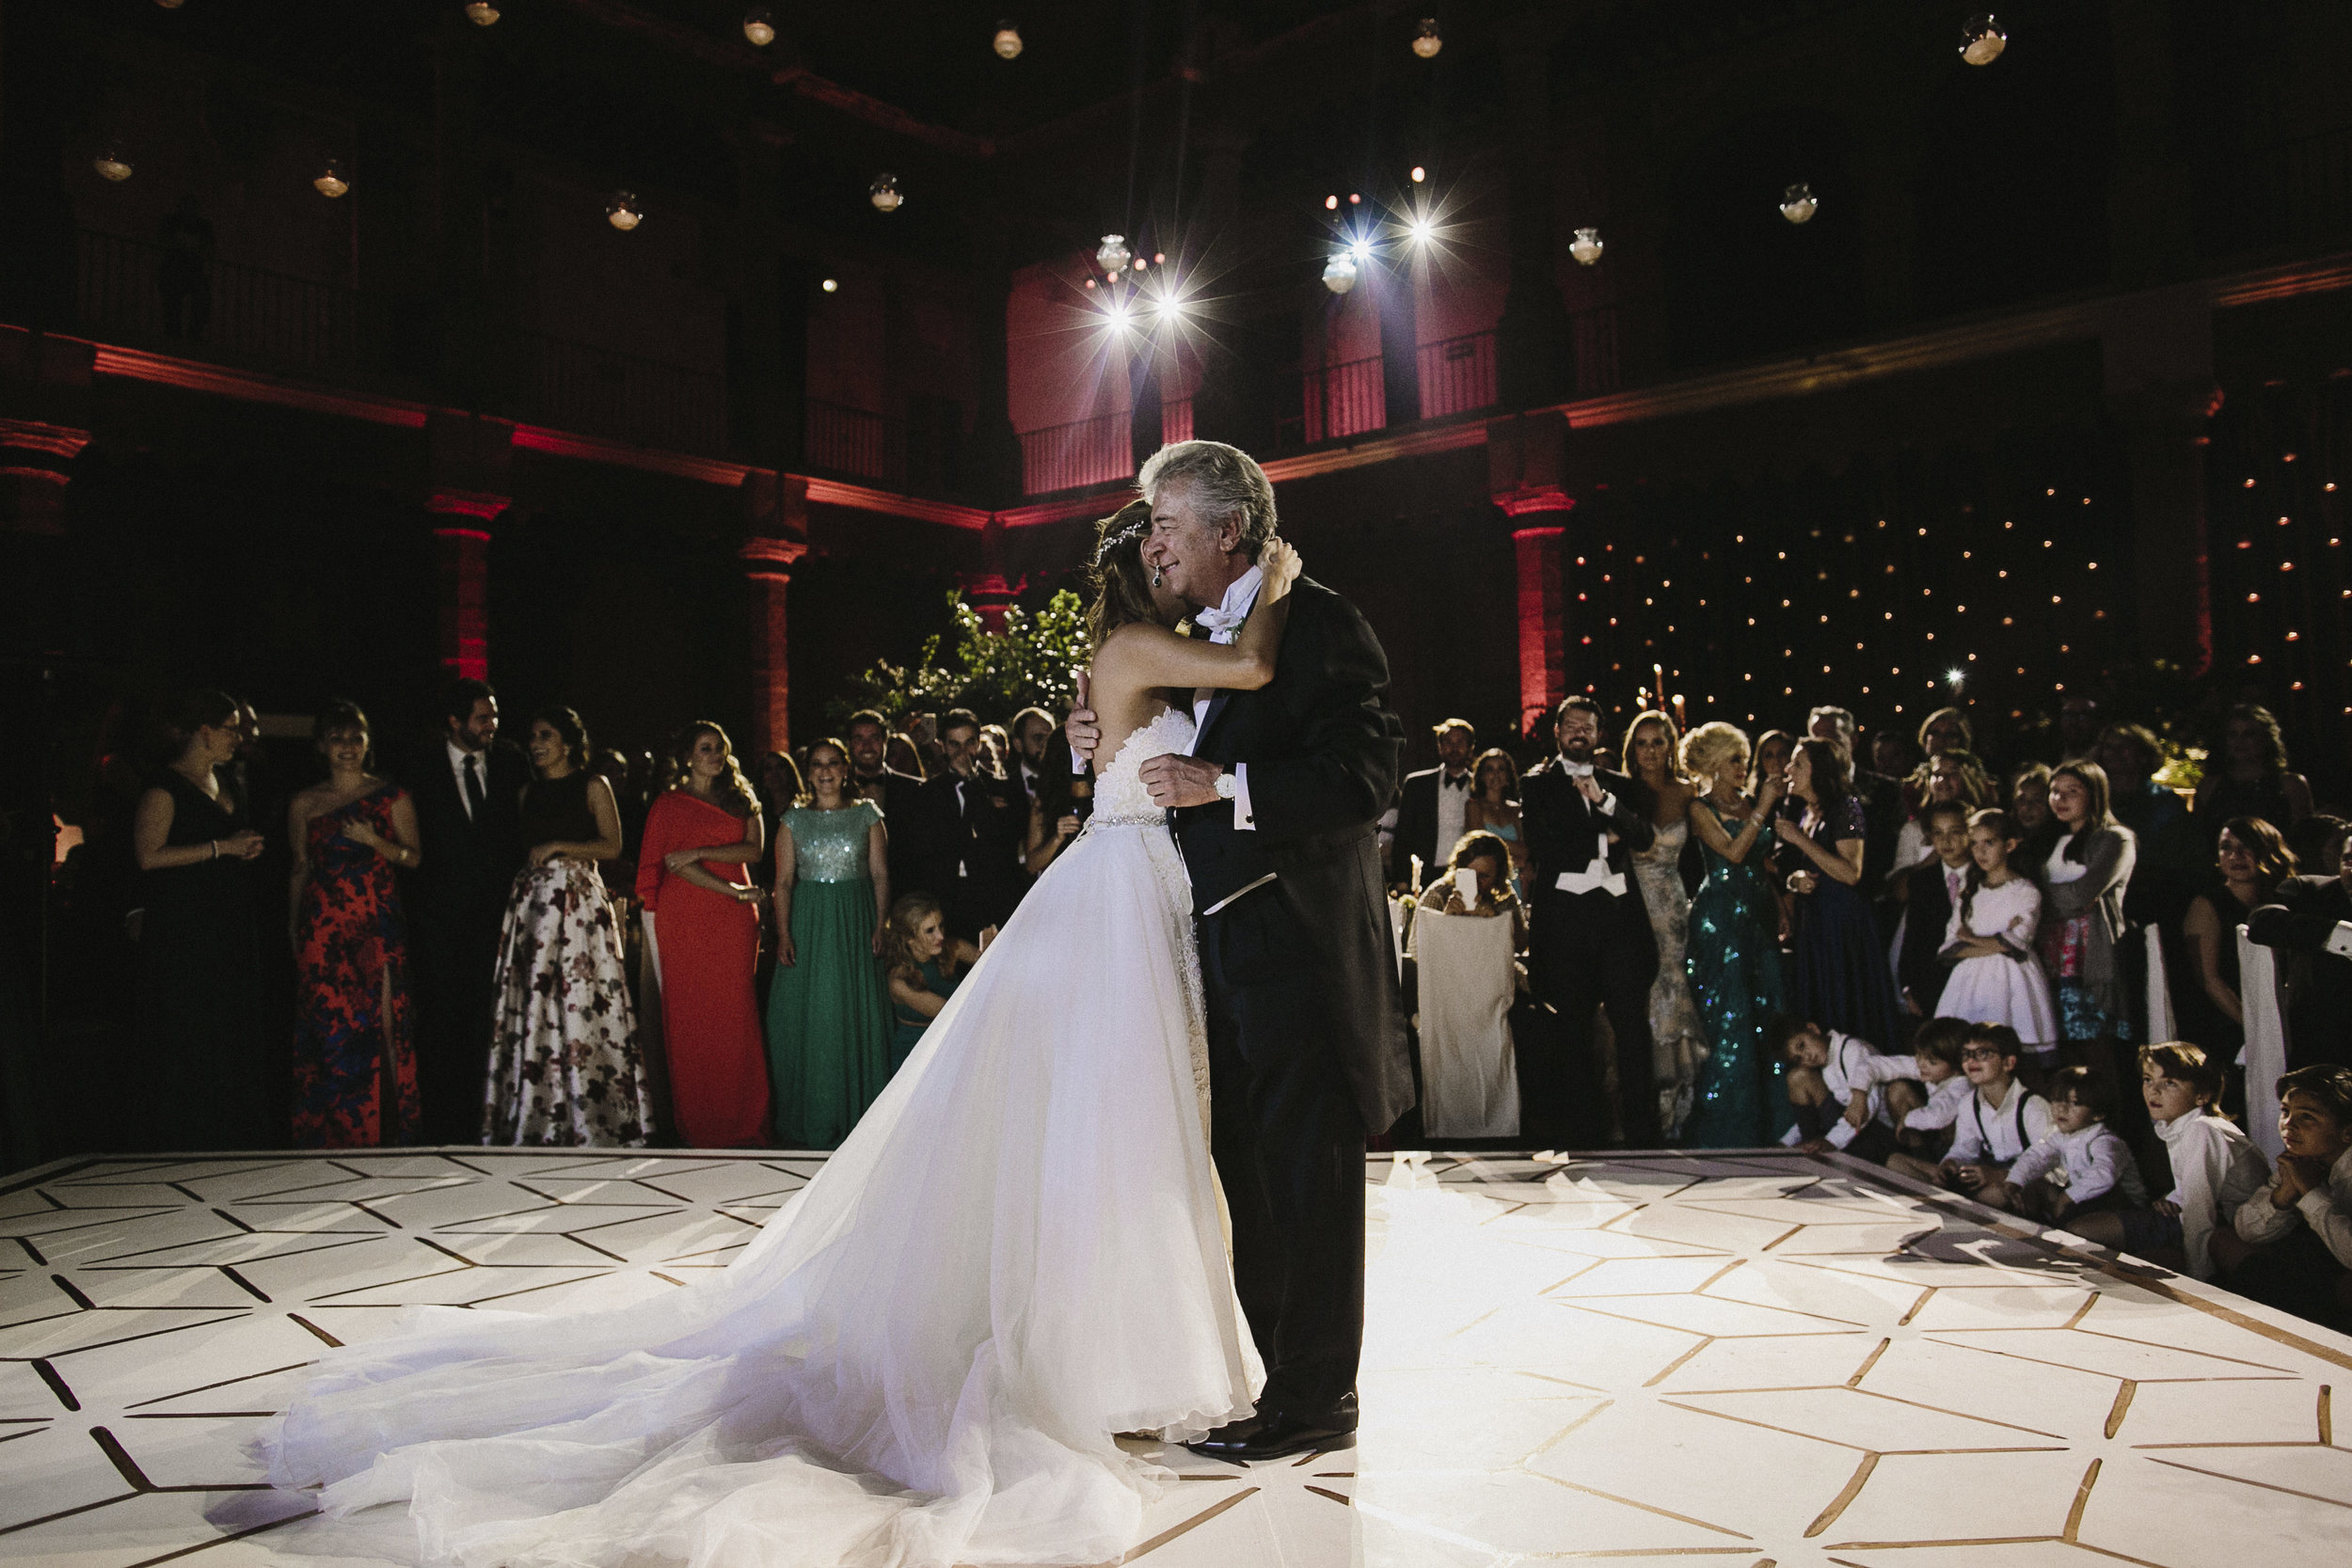 alfonso_flores_destination_wedding_photogrpahy_paola_alonso-993.JPG